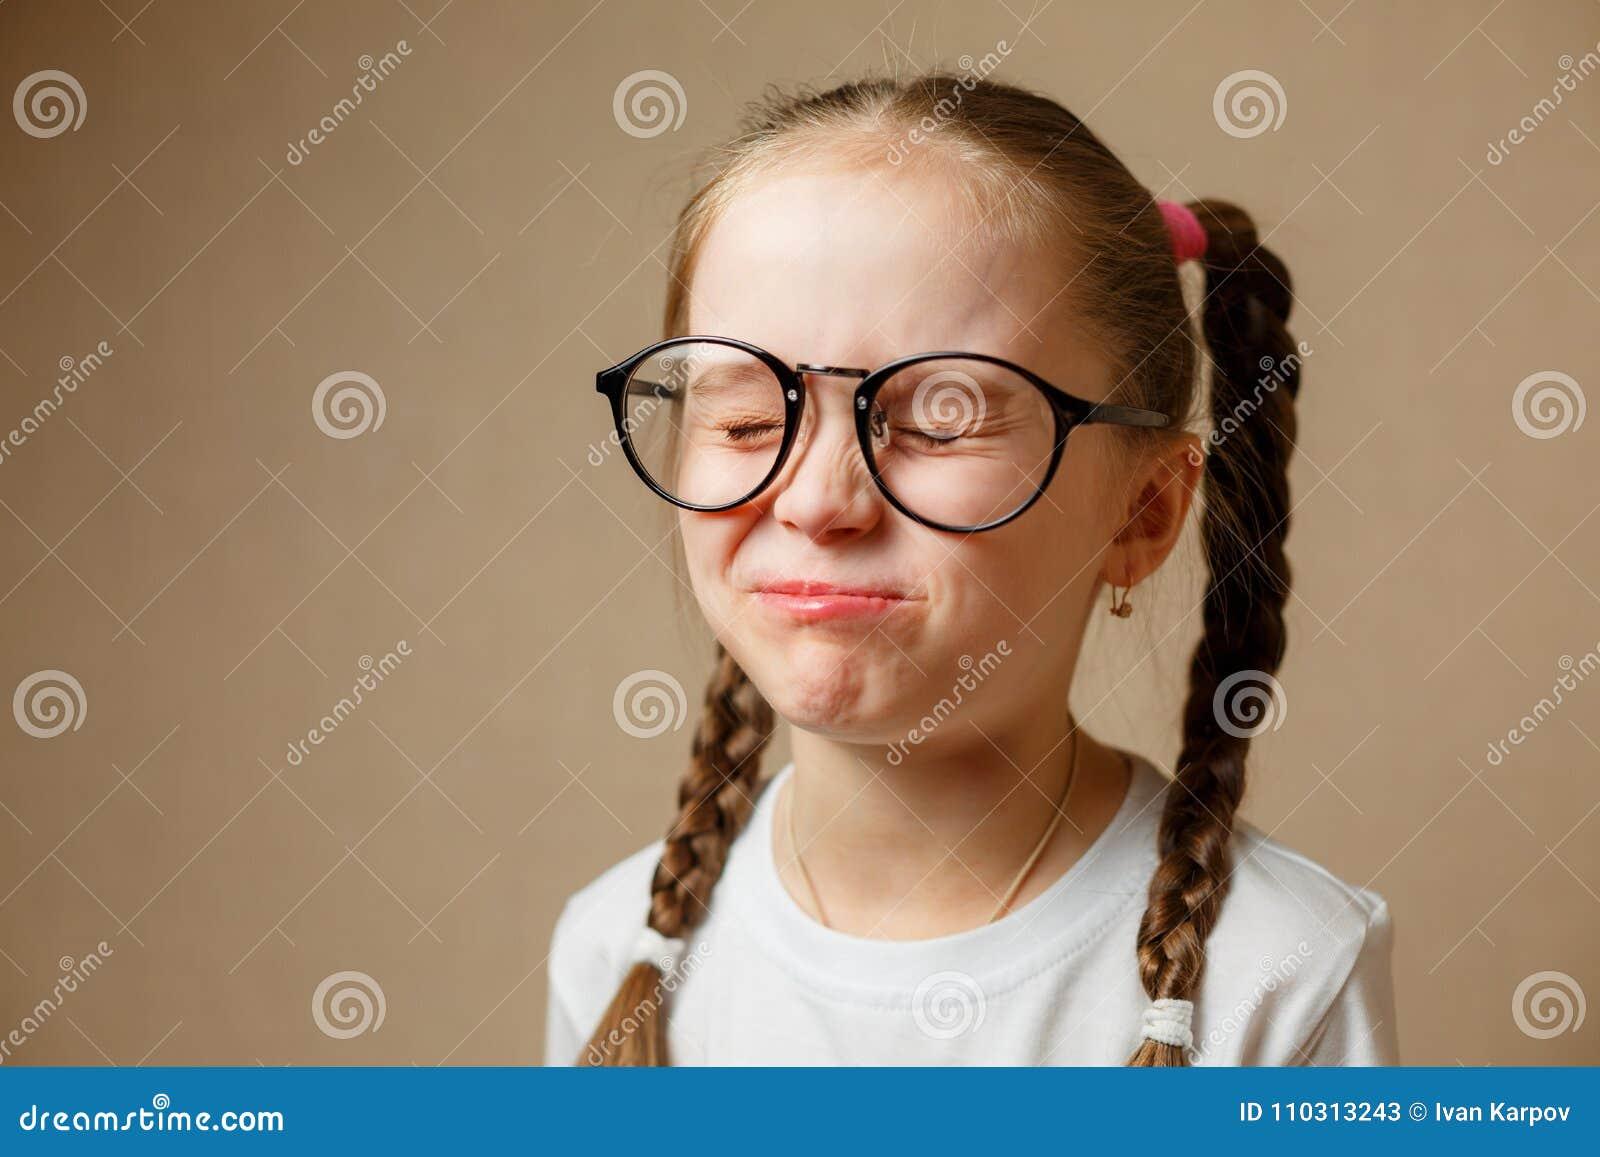 Beautiful little girl wearing glasses